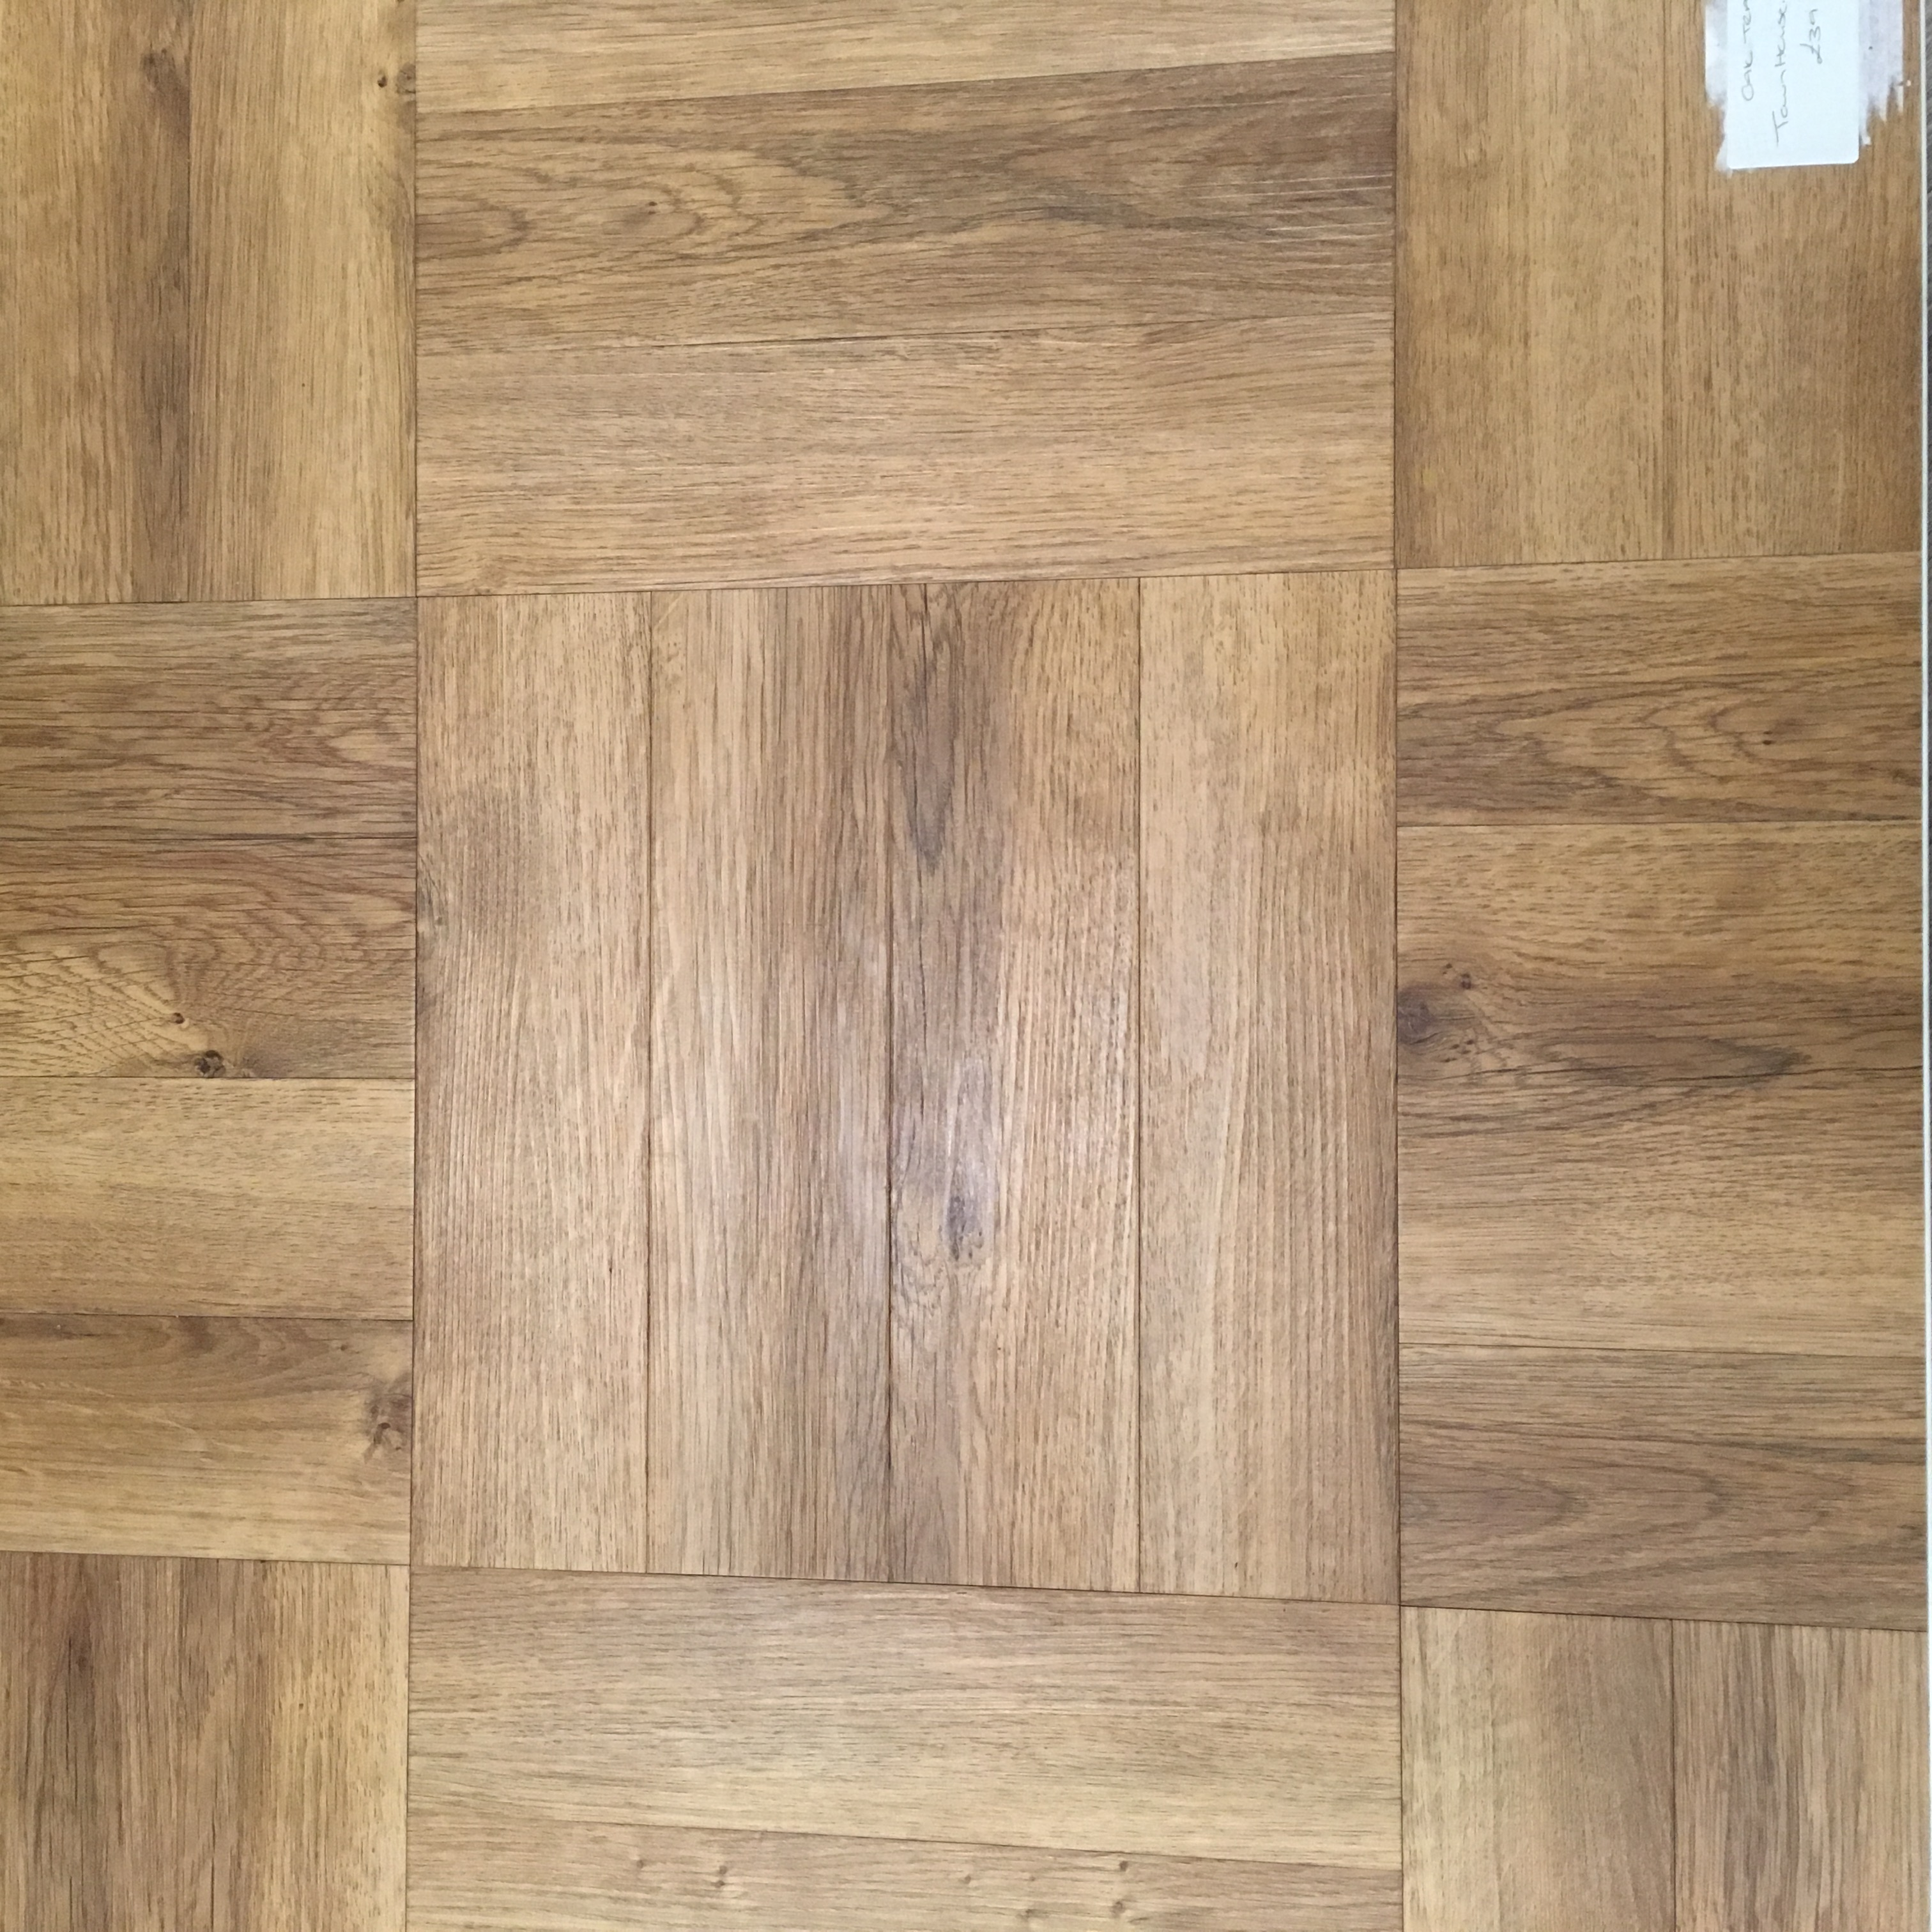 carpet-fit-wales-cynon-valley-aberdare-south-aberaman-experienced-skilled-great-customer-service-flooring-OFFER-vusta-herringbone-oak-tradition